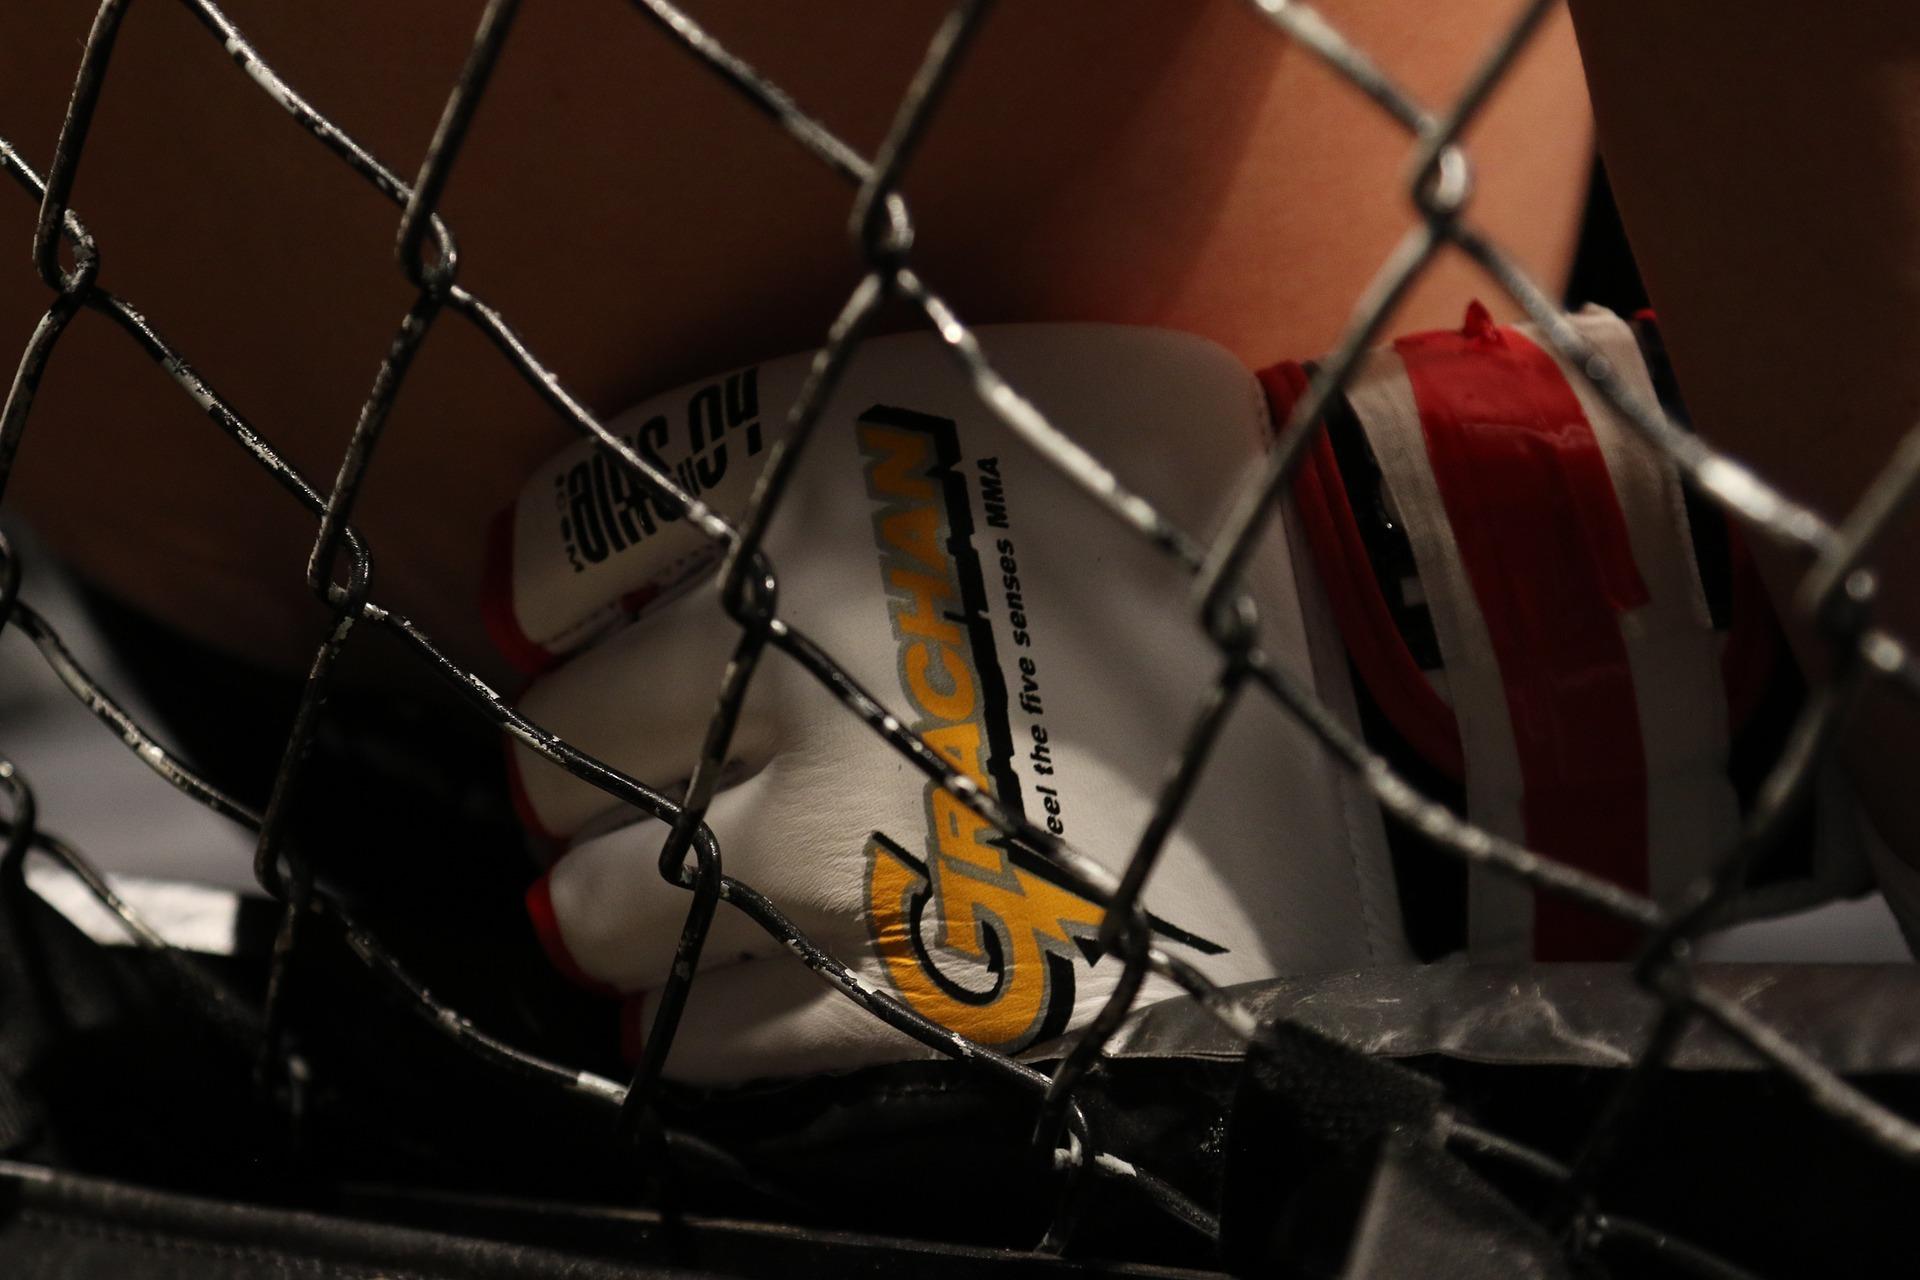 mma-gloves